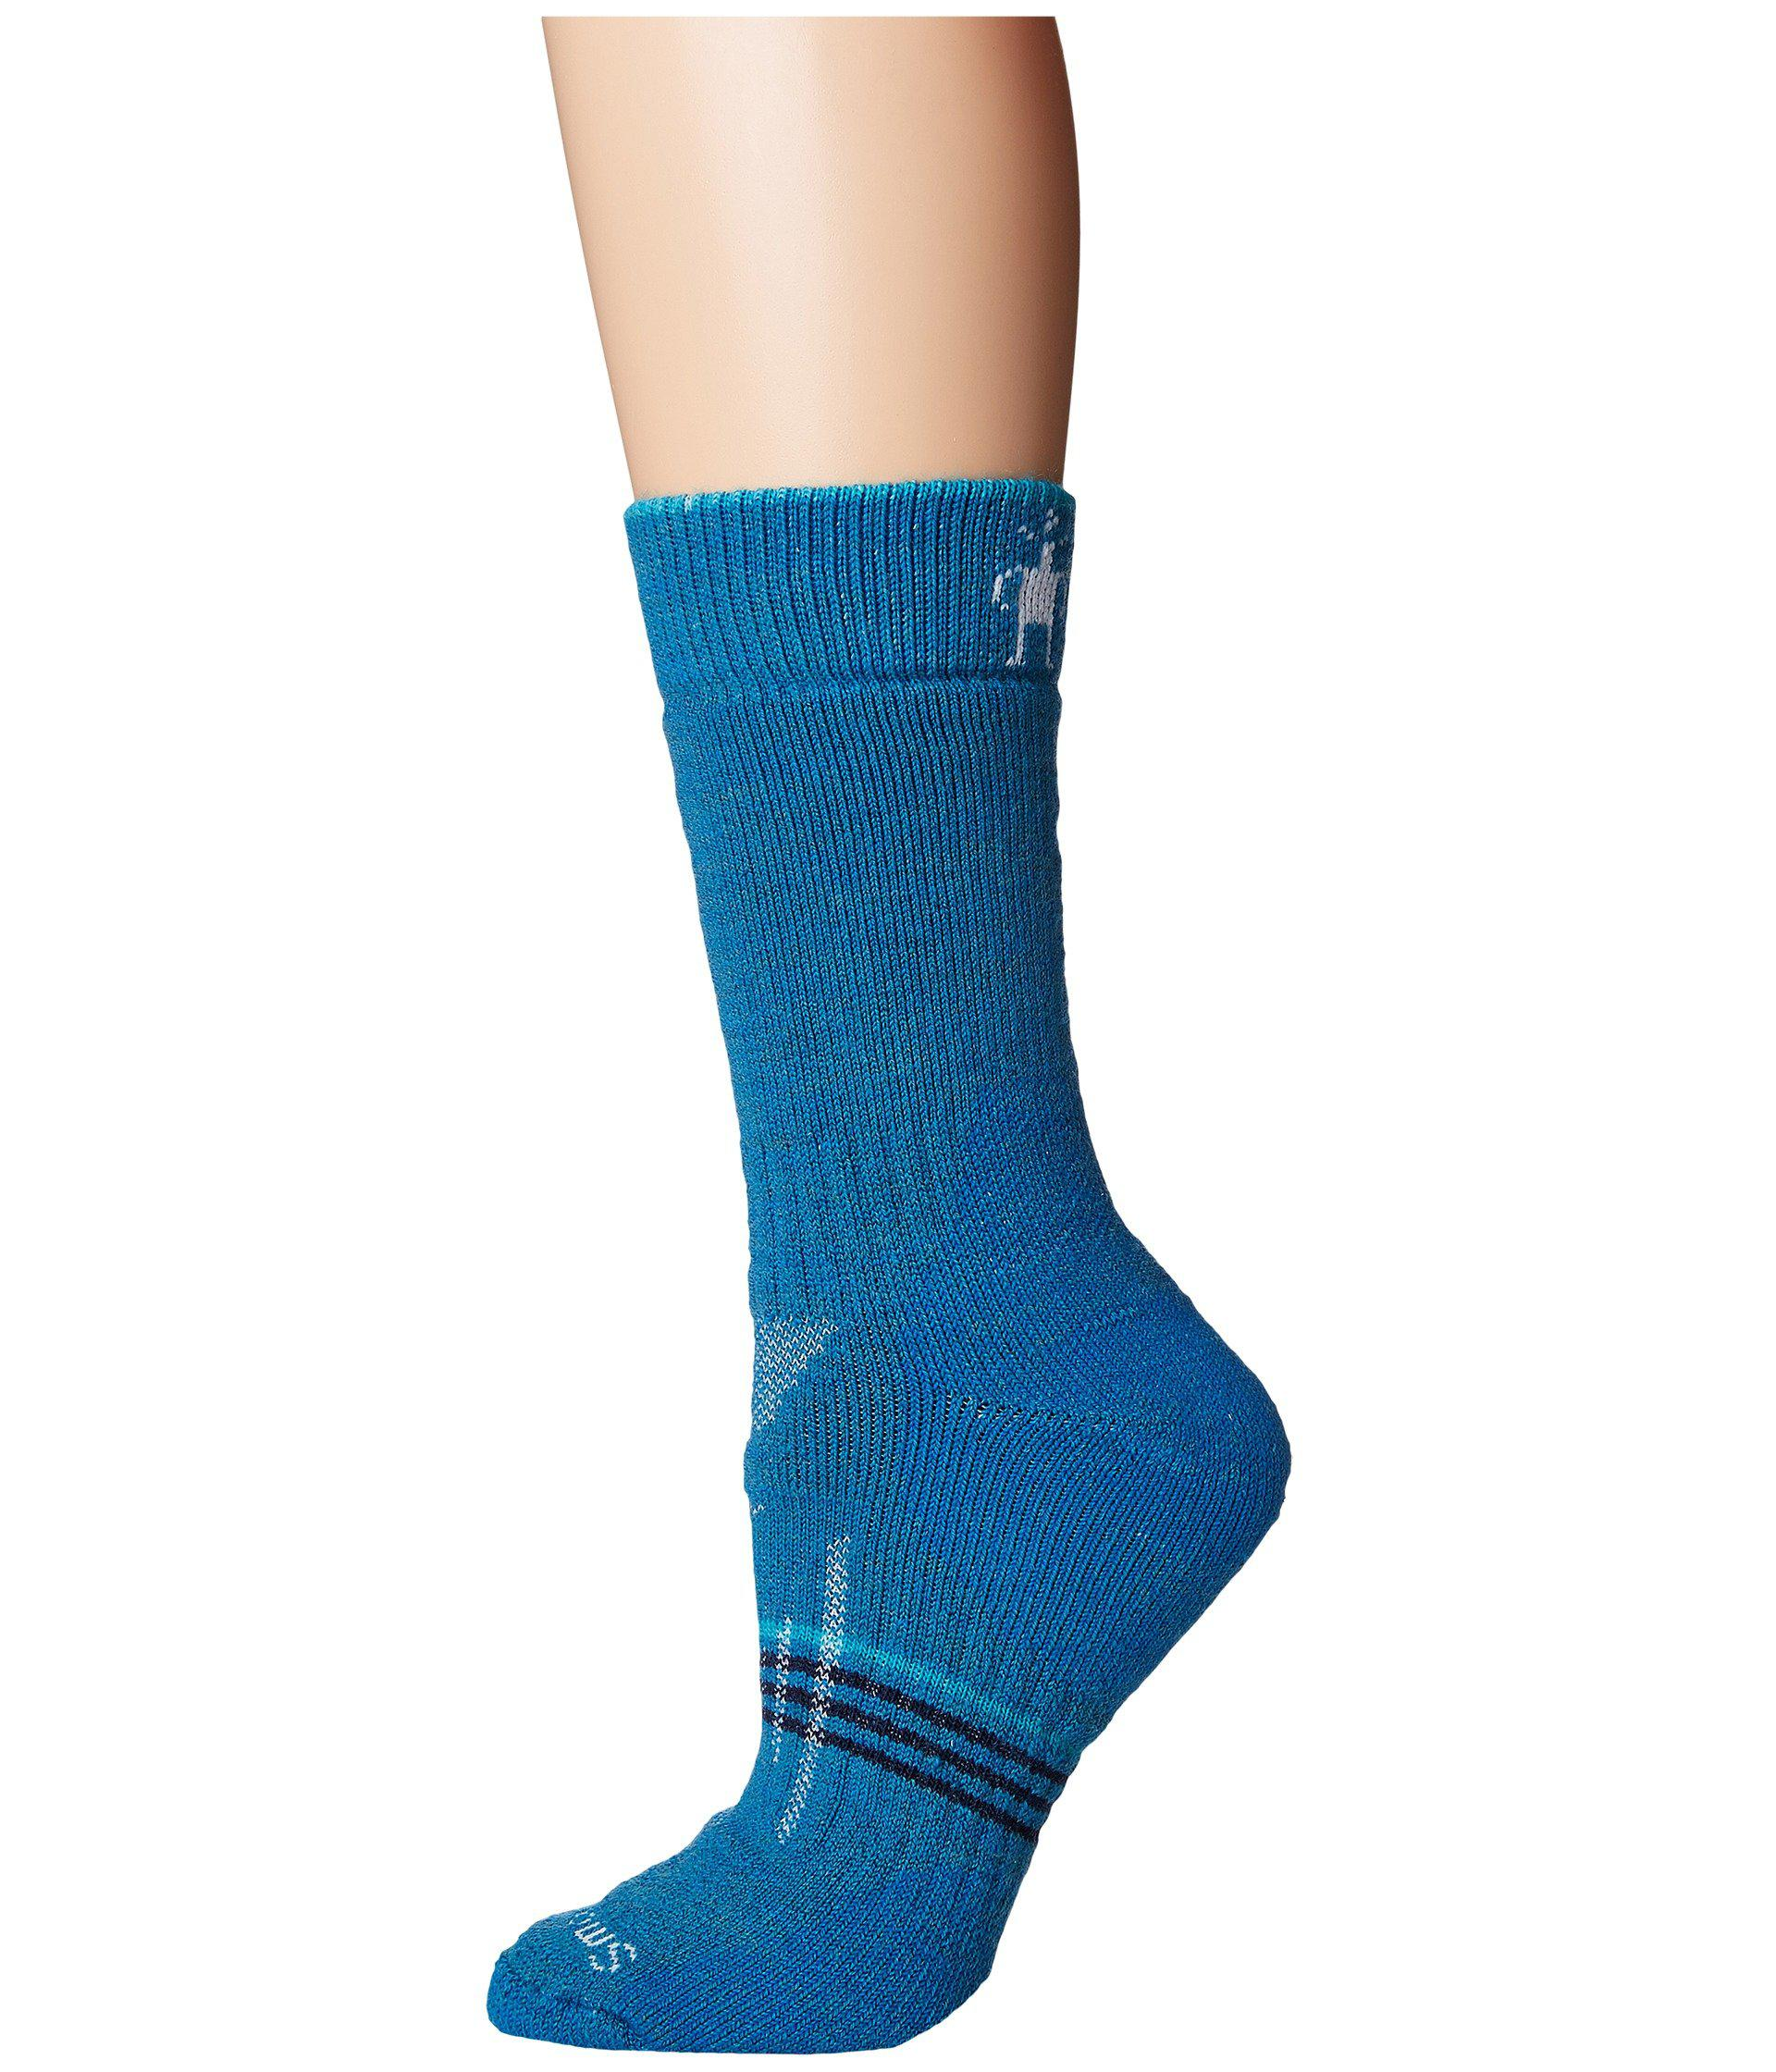 c2202a887 Smartwool. Blue Phd Outdoor Heavy Crew (charcoal) Women s Crew Cut Socks  Shoes